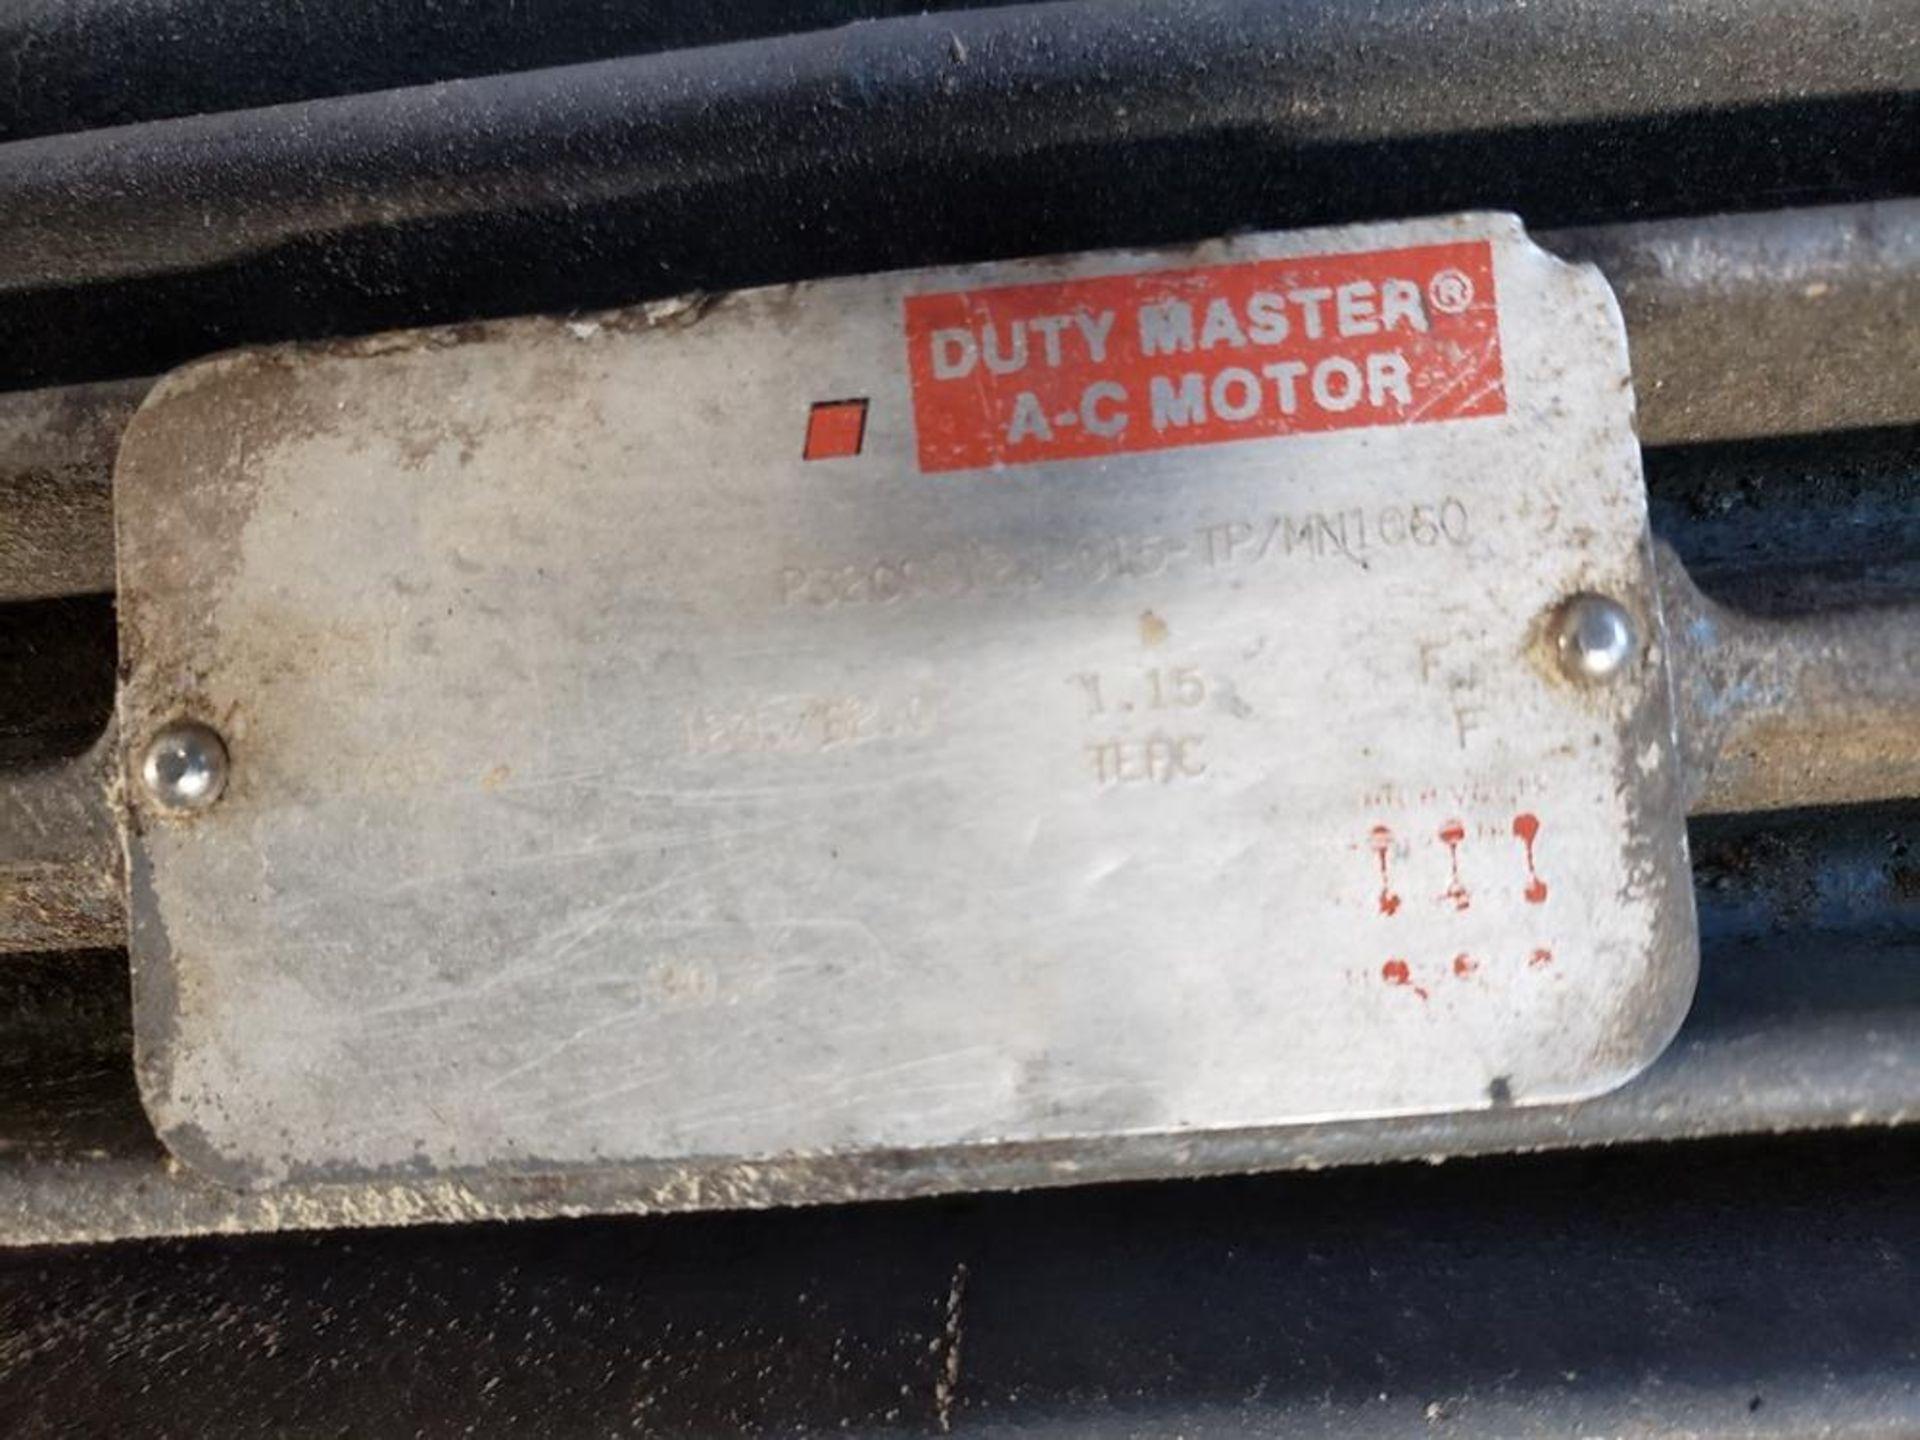 Lot 336 - 20 HP Blower | Rig Fee: $300